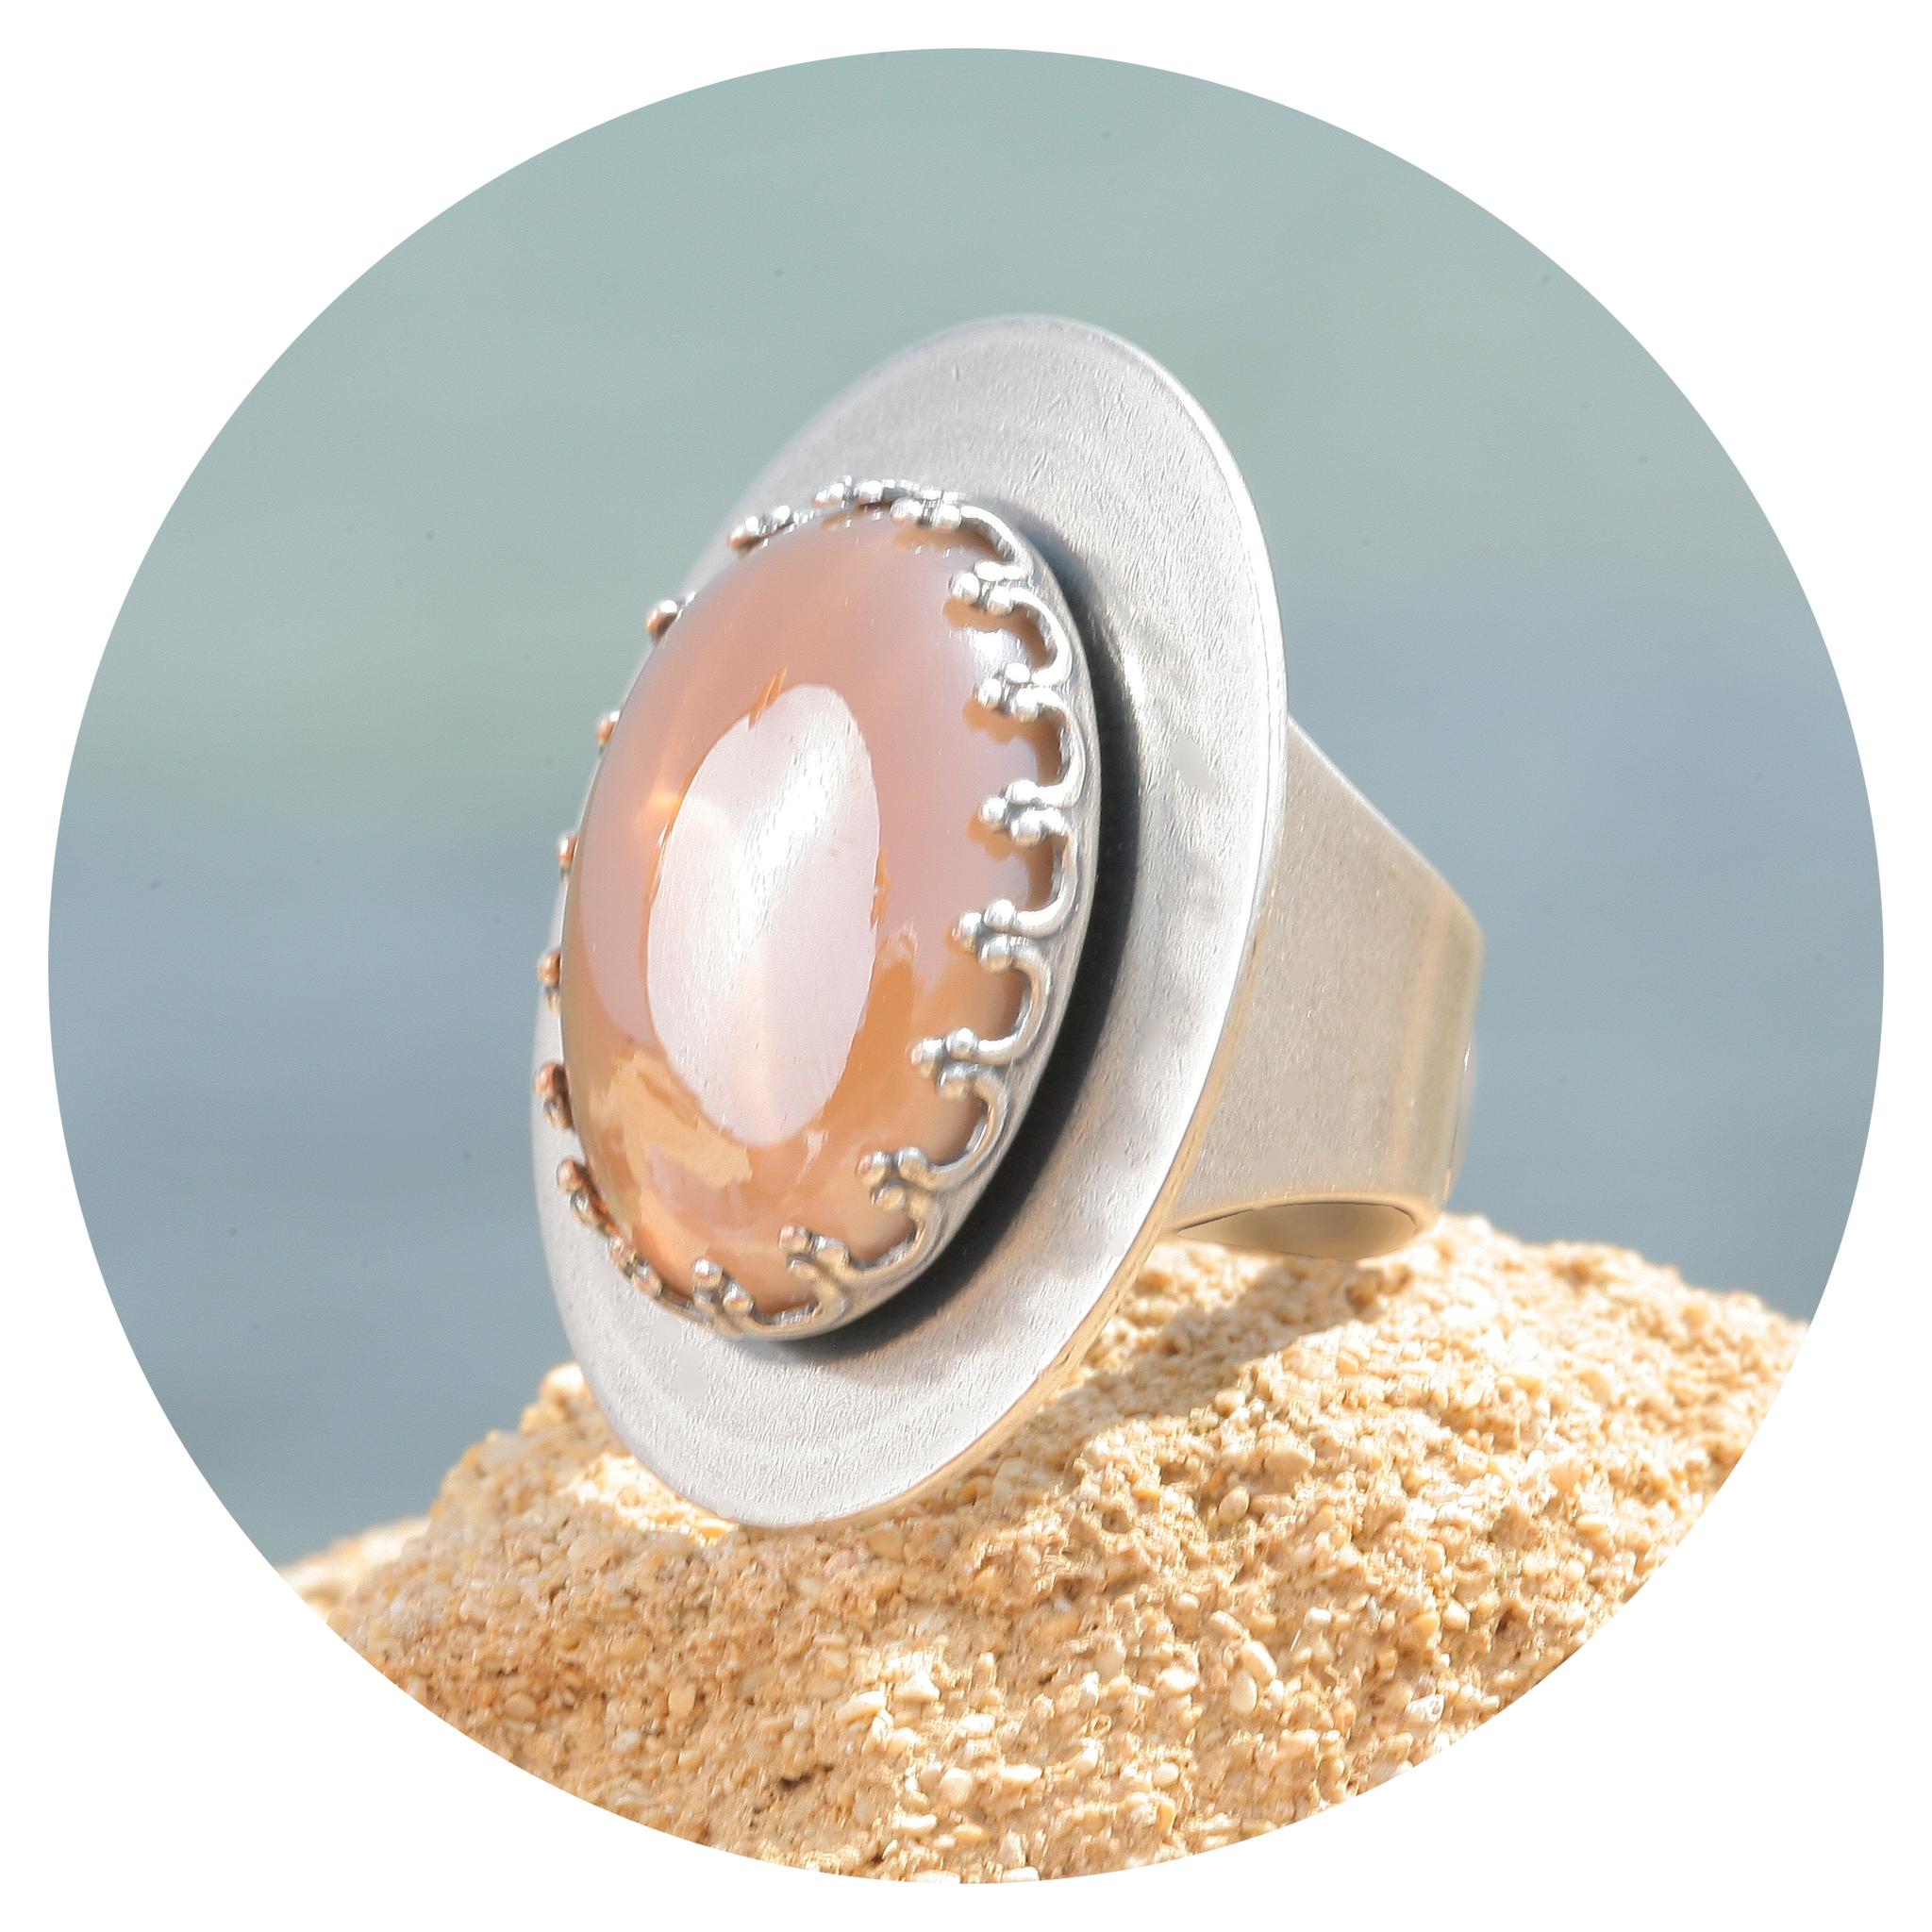 artjany Ring mit einem Cabochon in hellbraun metallic